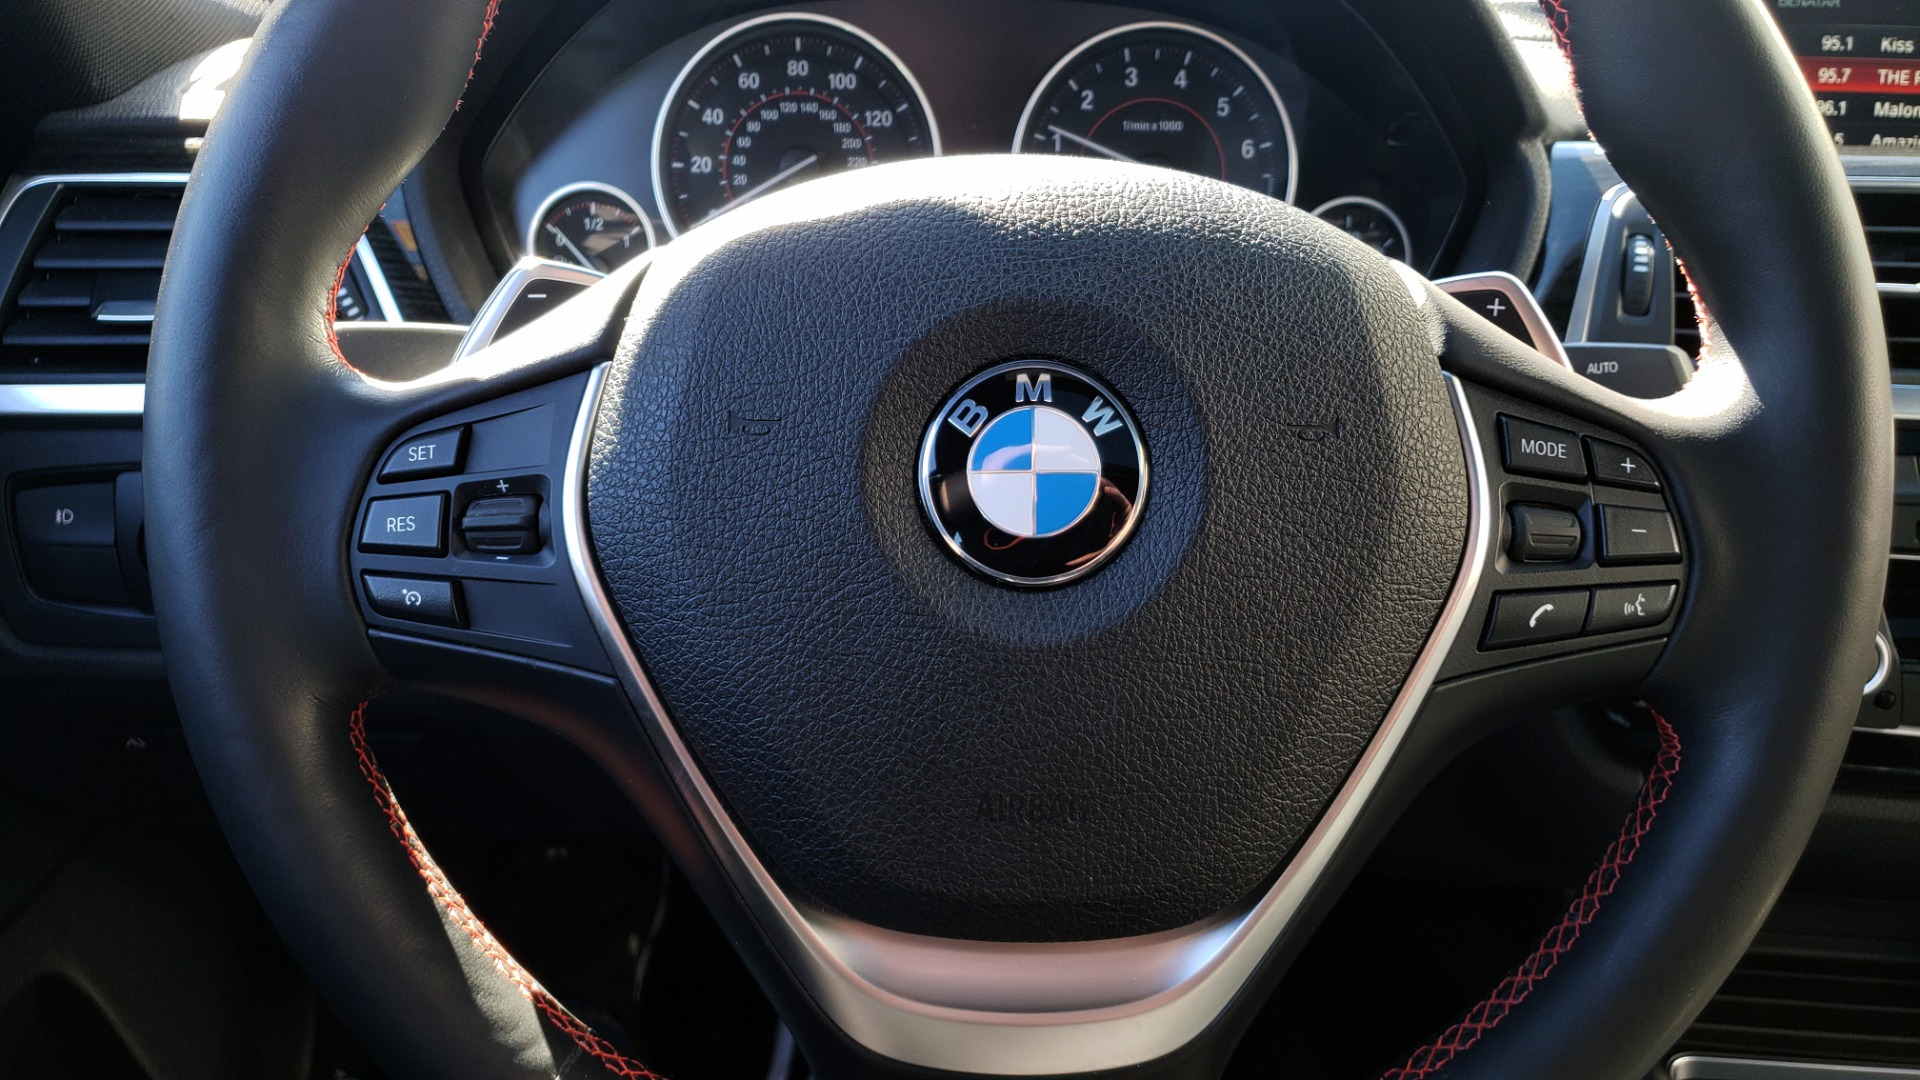 Used 2018 BMW 4 SERIES 430IXDRIVE / PREMIUM / NAV / SUNROOF / ESSENTIALS PKG for sale $28,995 at Formula Imports in Charlotte NC 28227 39